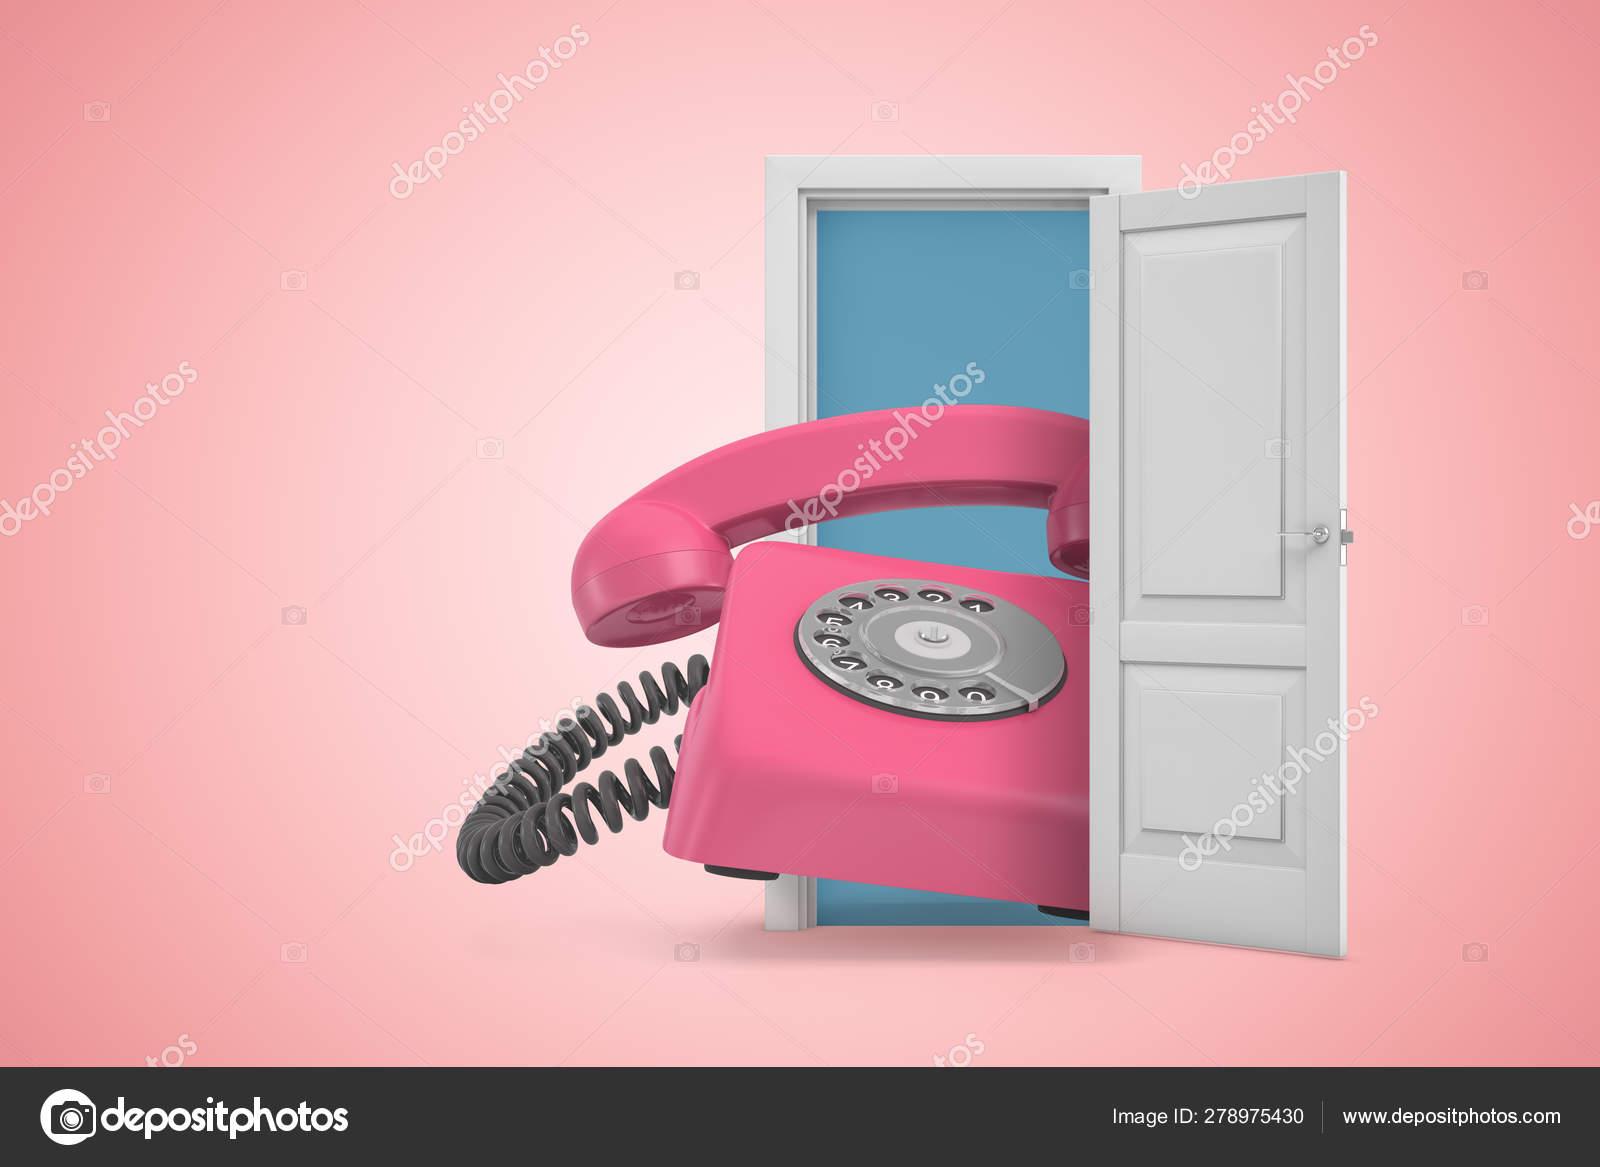 Landline Phone Service >> 3d Rendering Of Huge Pink Retro Landline Phone Emerging From